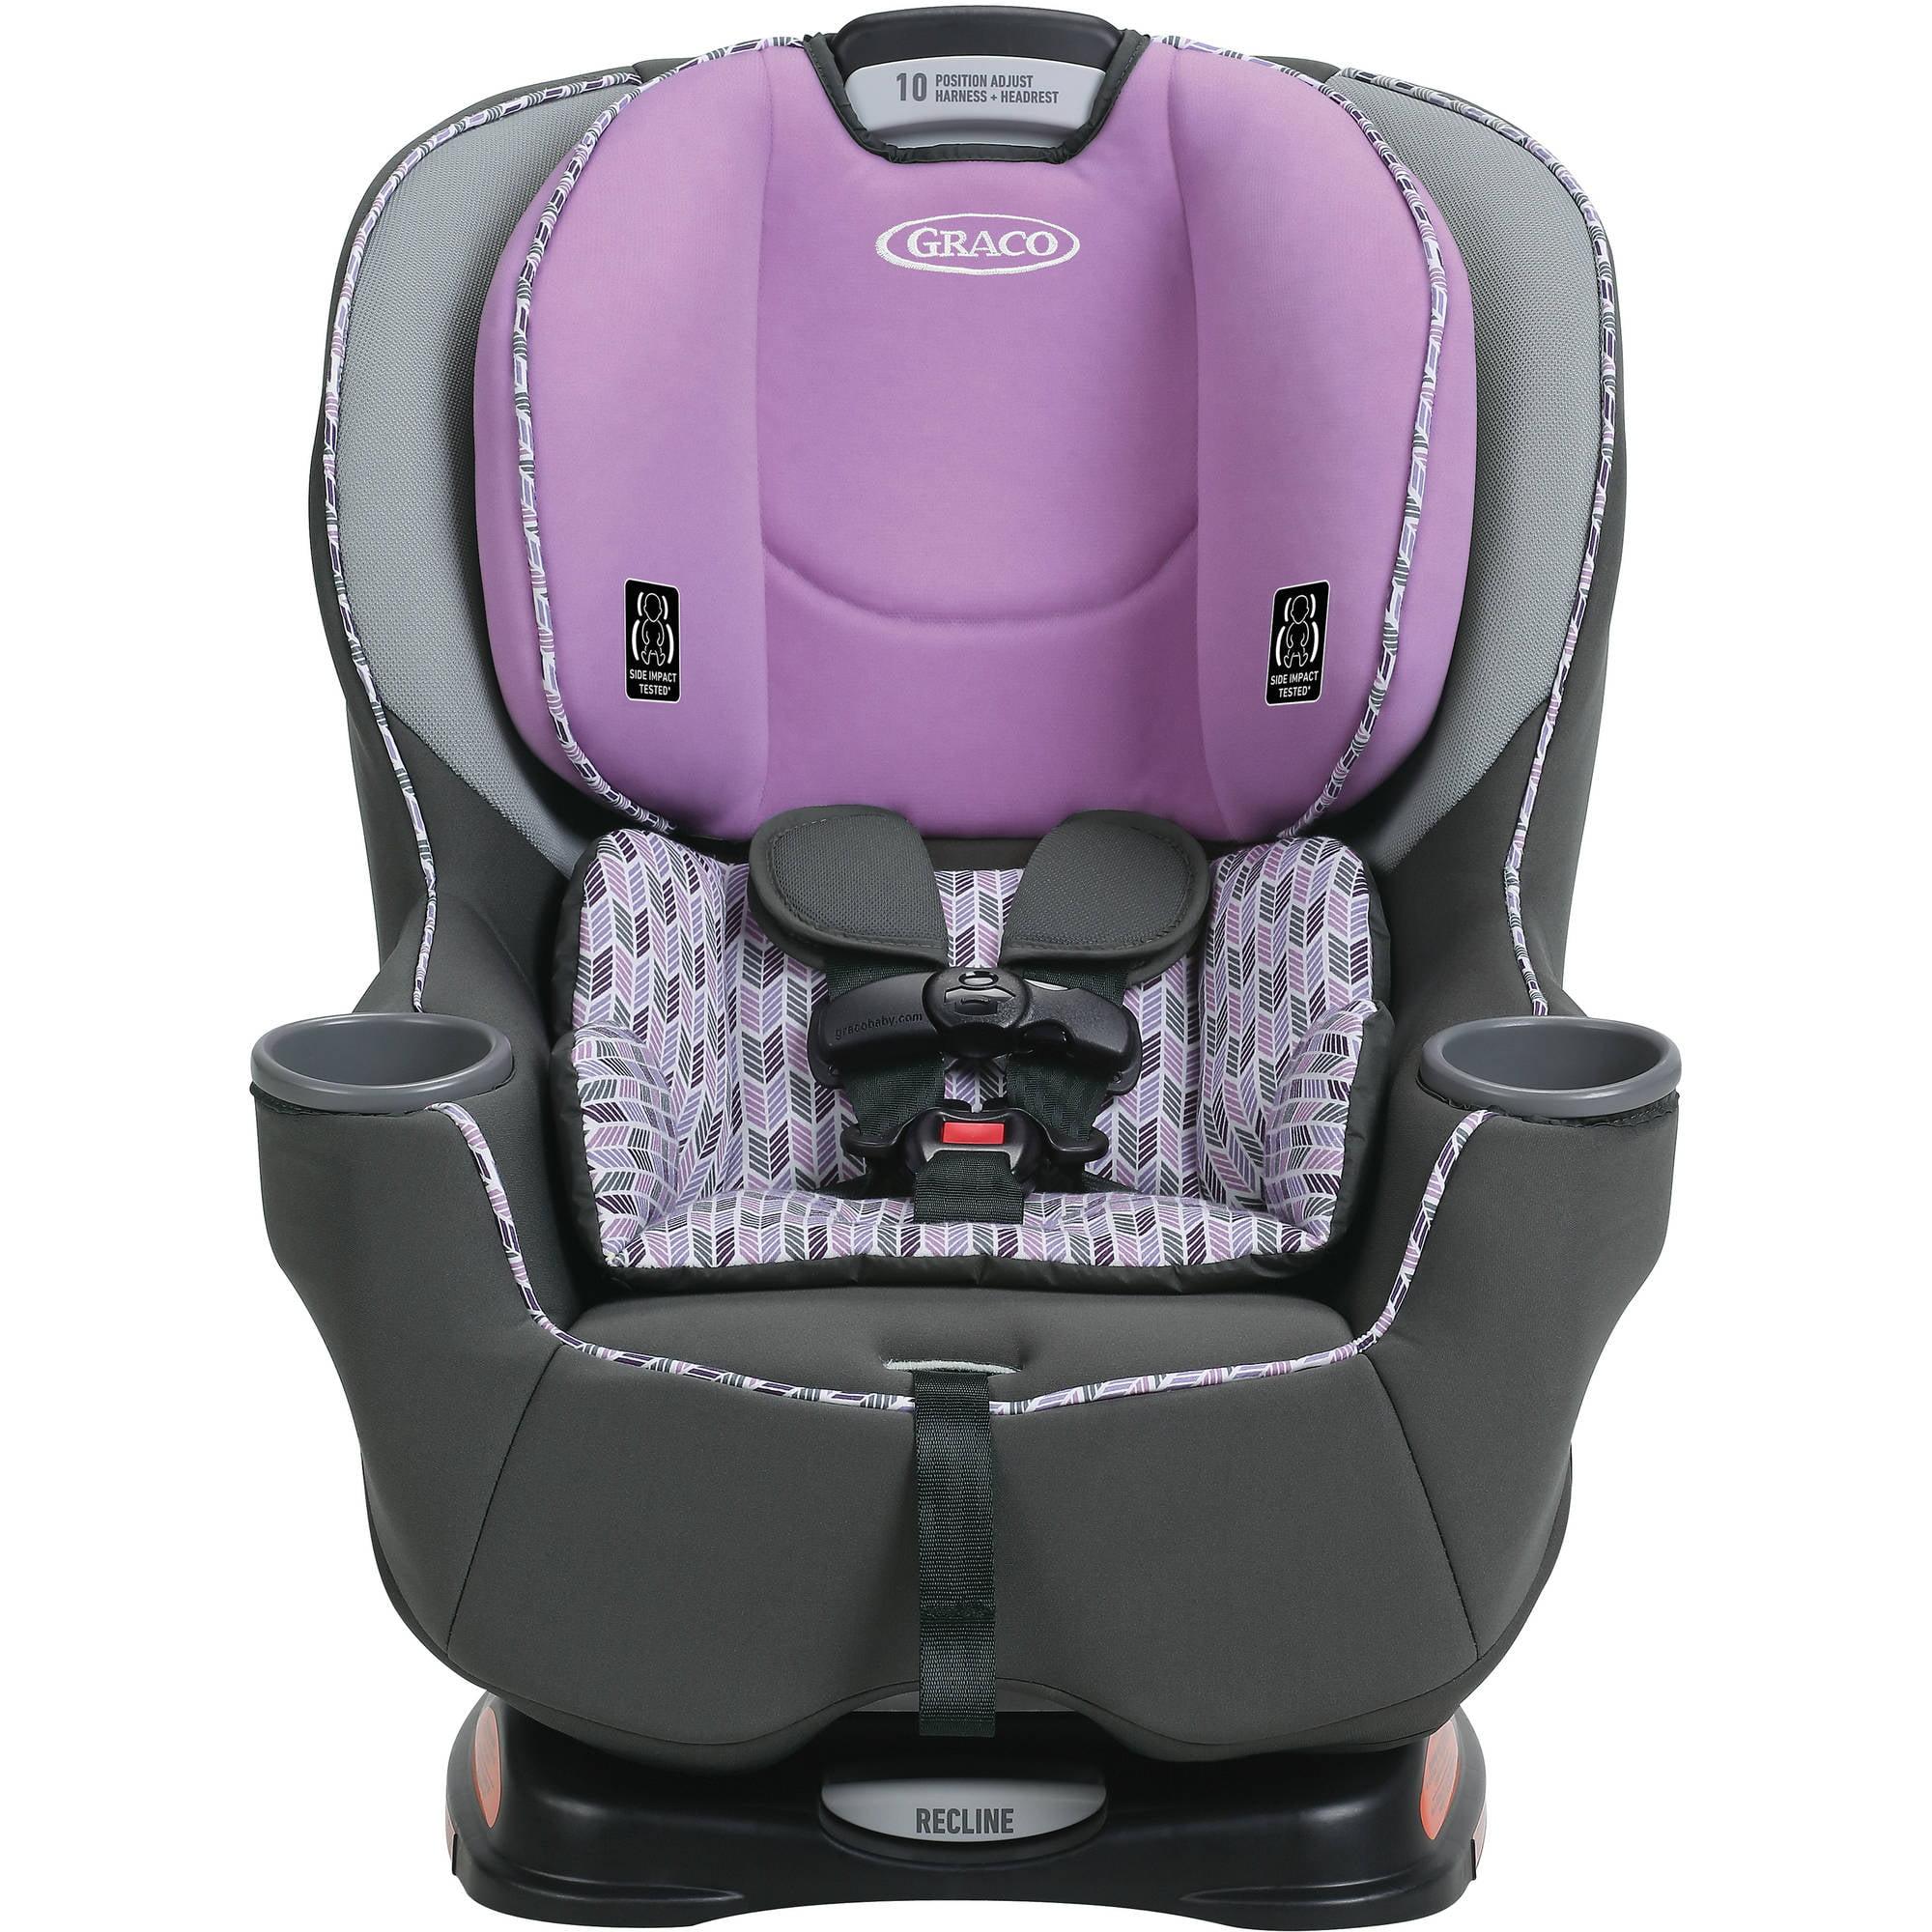 Graco Sequel 65 Convertible Car Seat, Caden - Walmart.com